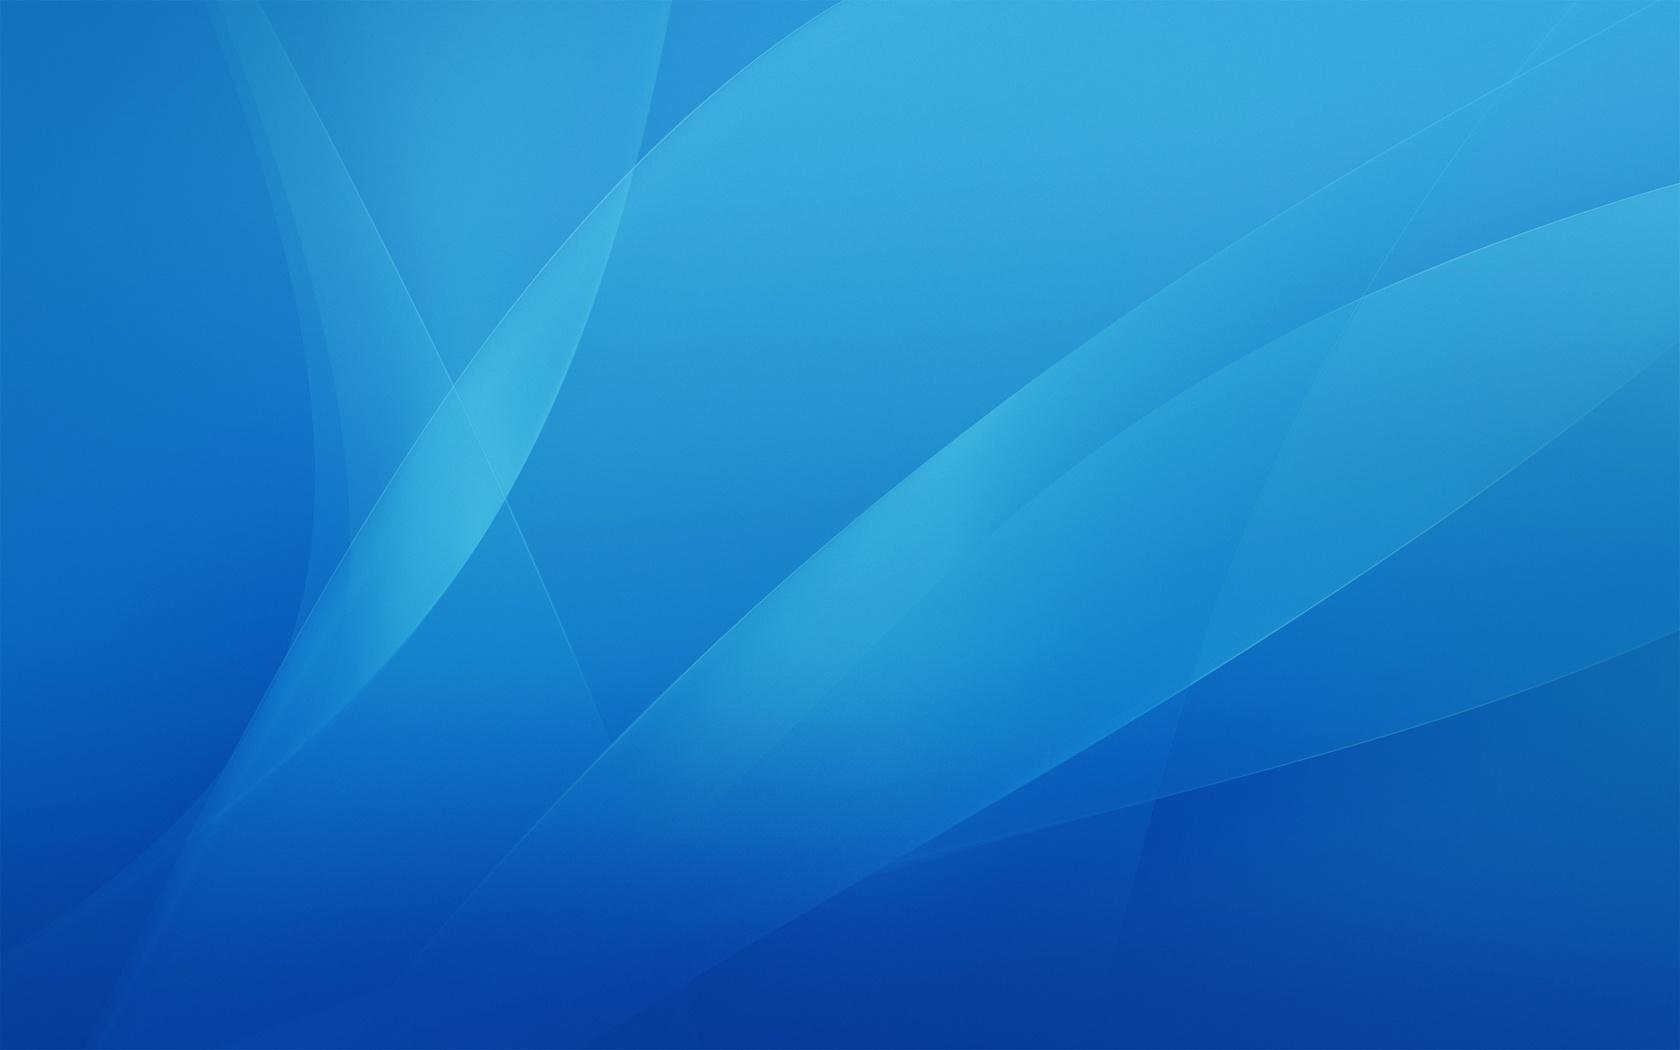 Blue Hd Wallpapers 1080p: Light Blue Abstract Wallpaper